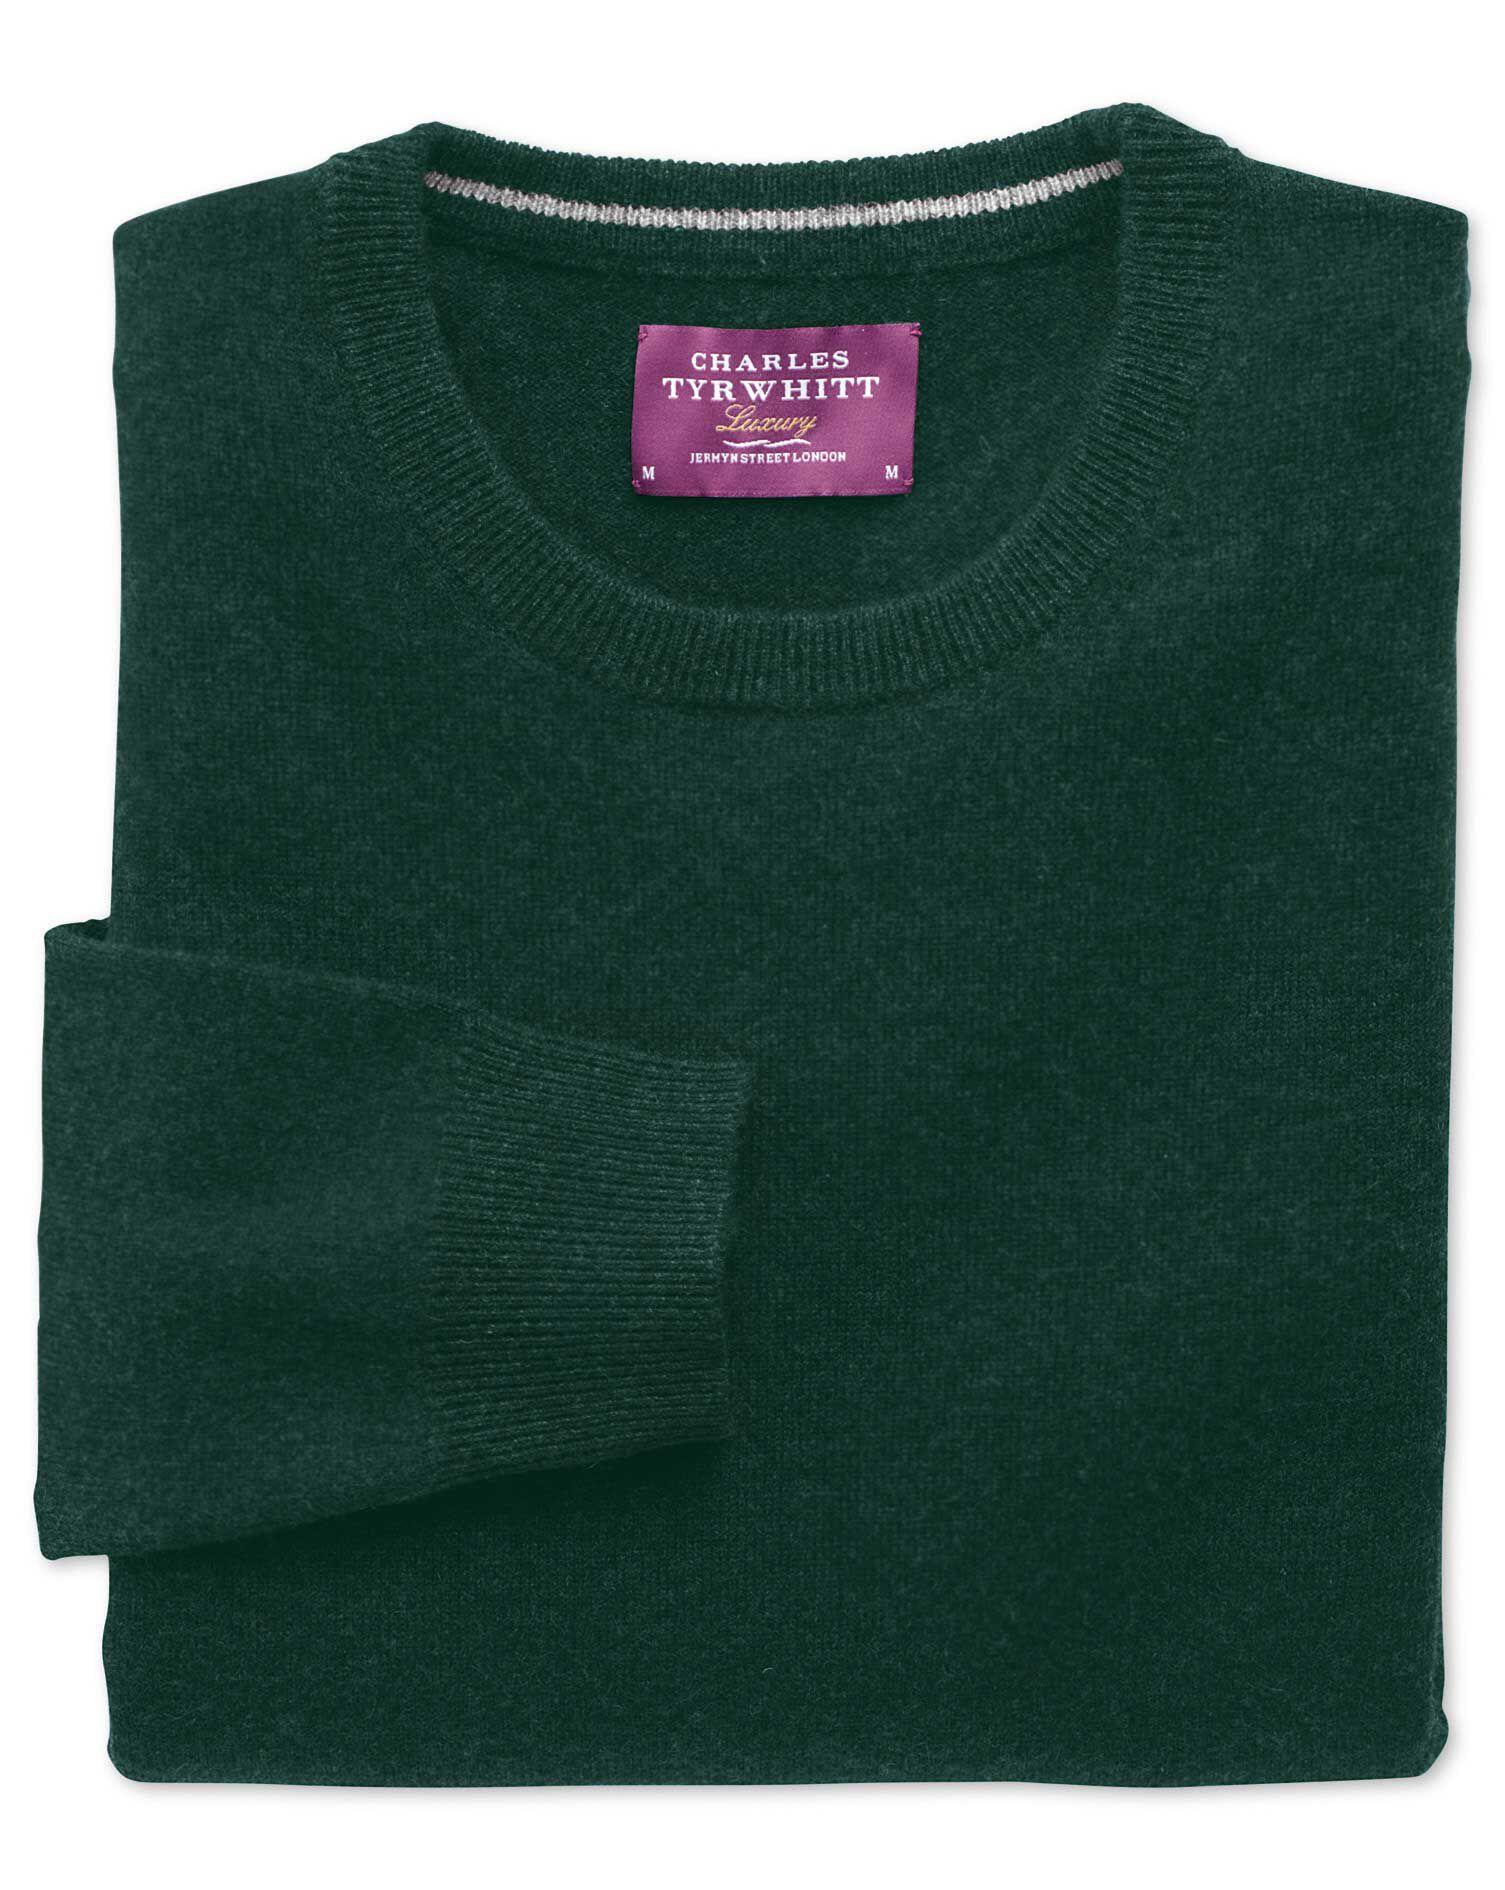 Green Cashmere Crew Neck Jumper Size Medium by Charles Tyrwhitt